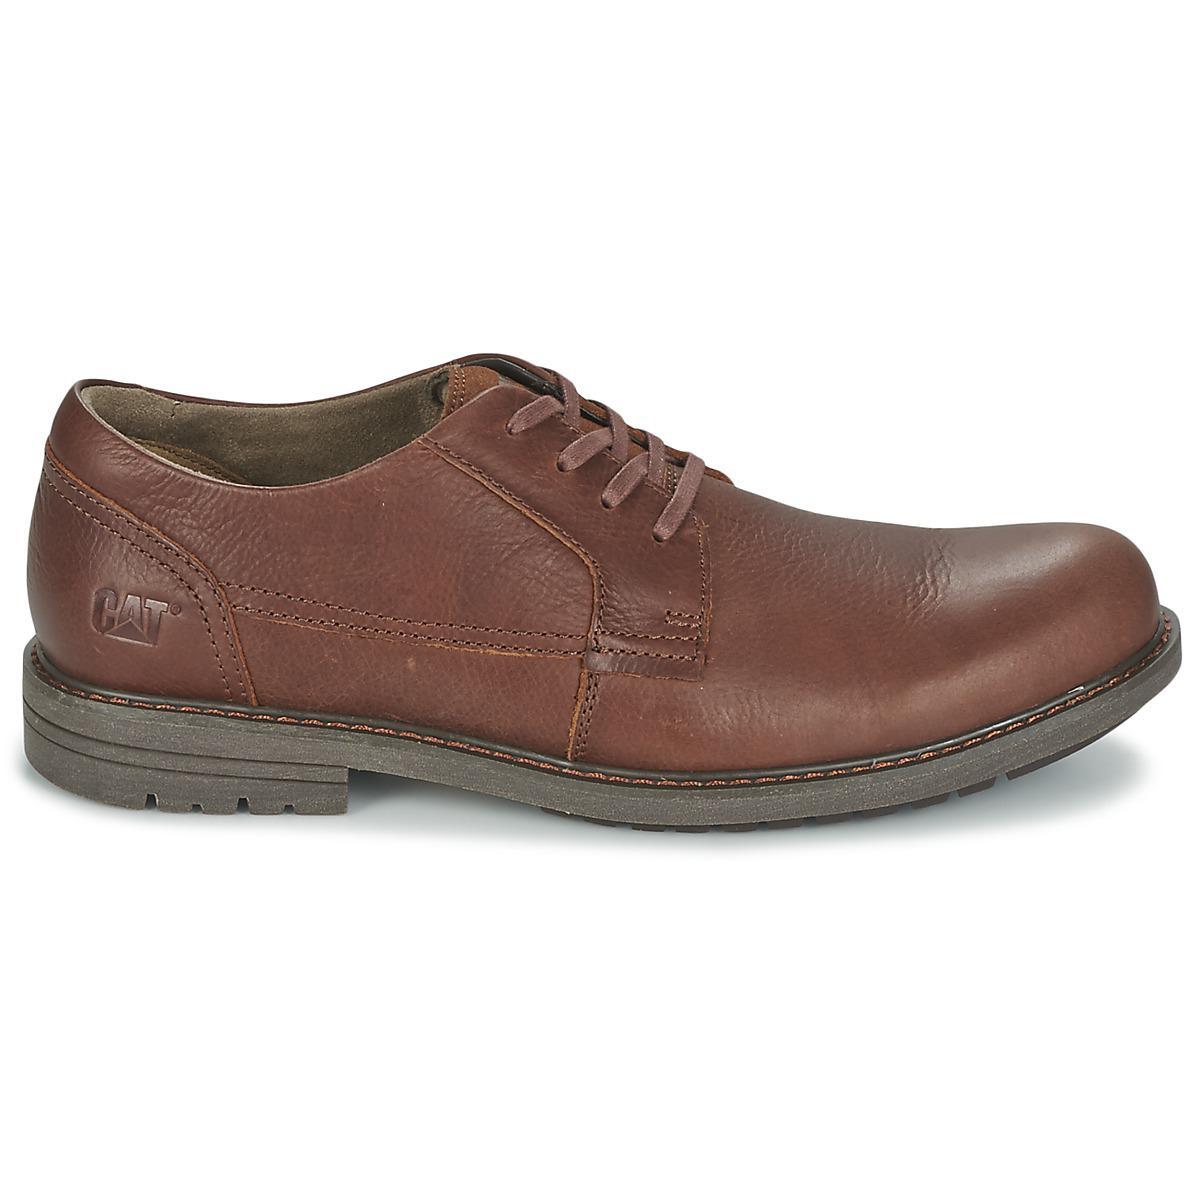 Caterpillar Cason Men's Casual Shoes In Brown for Men